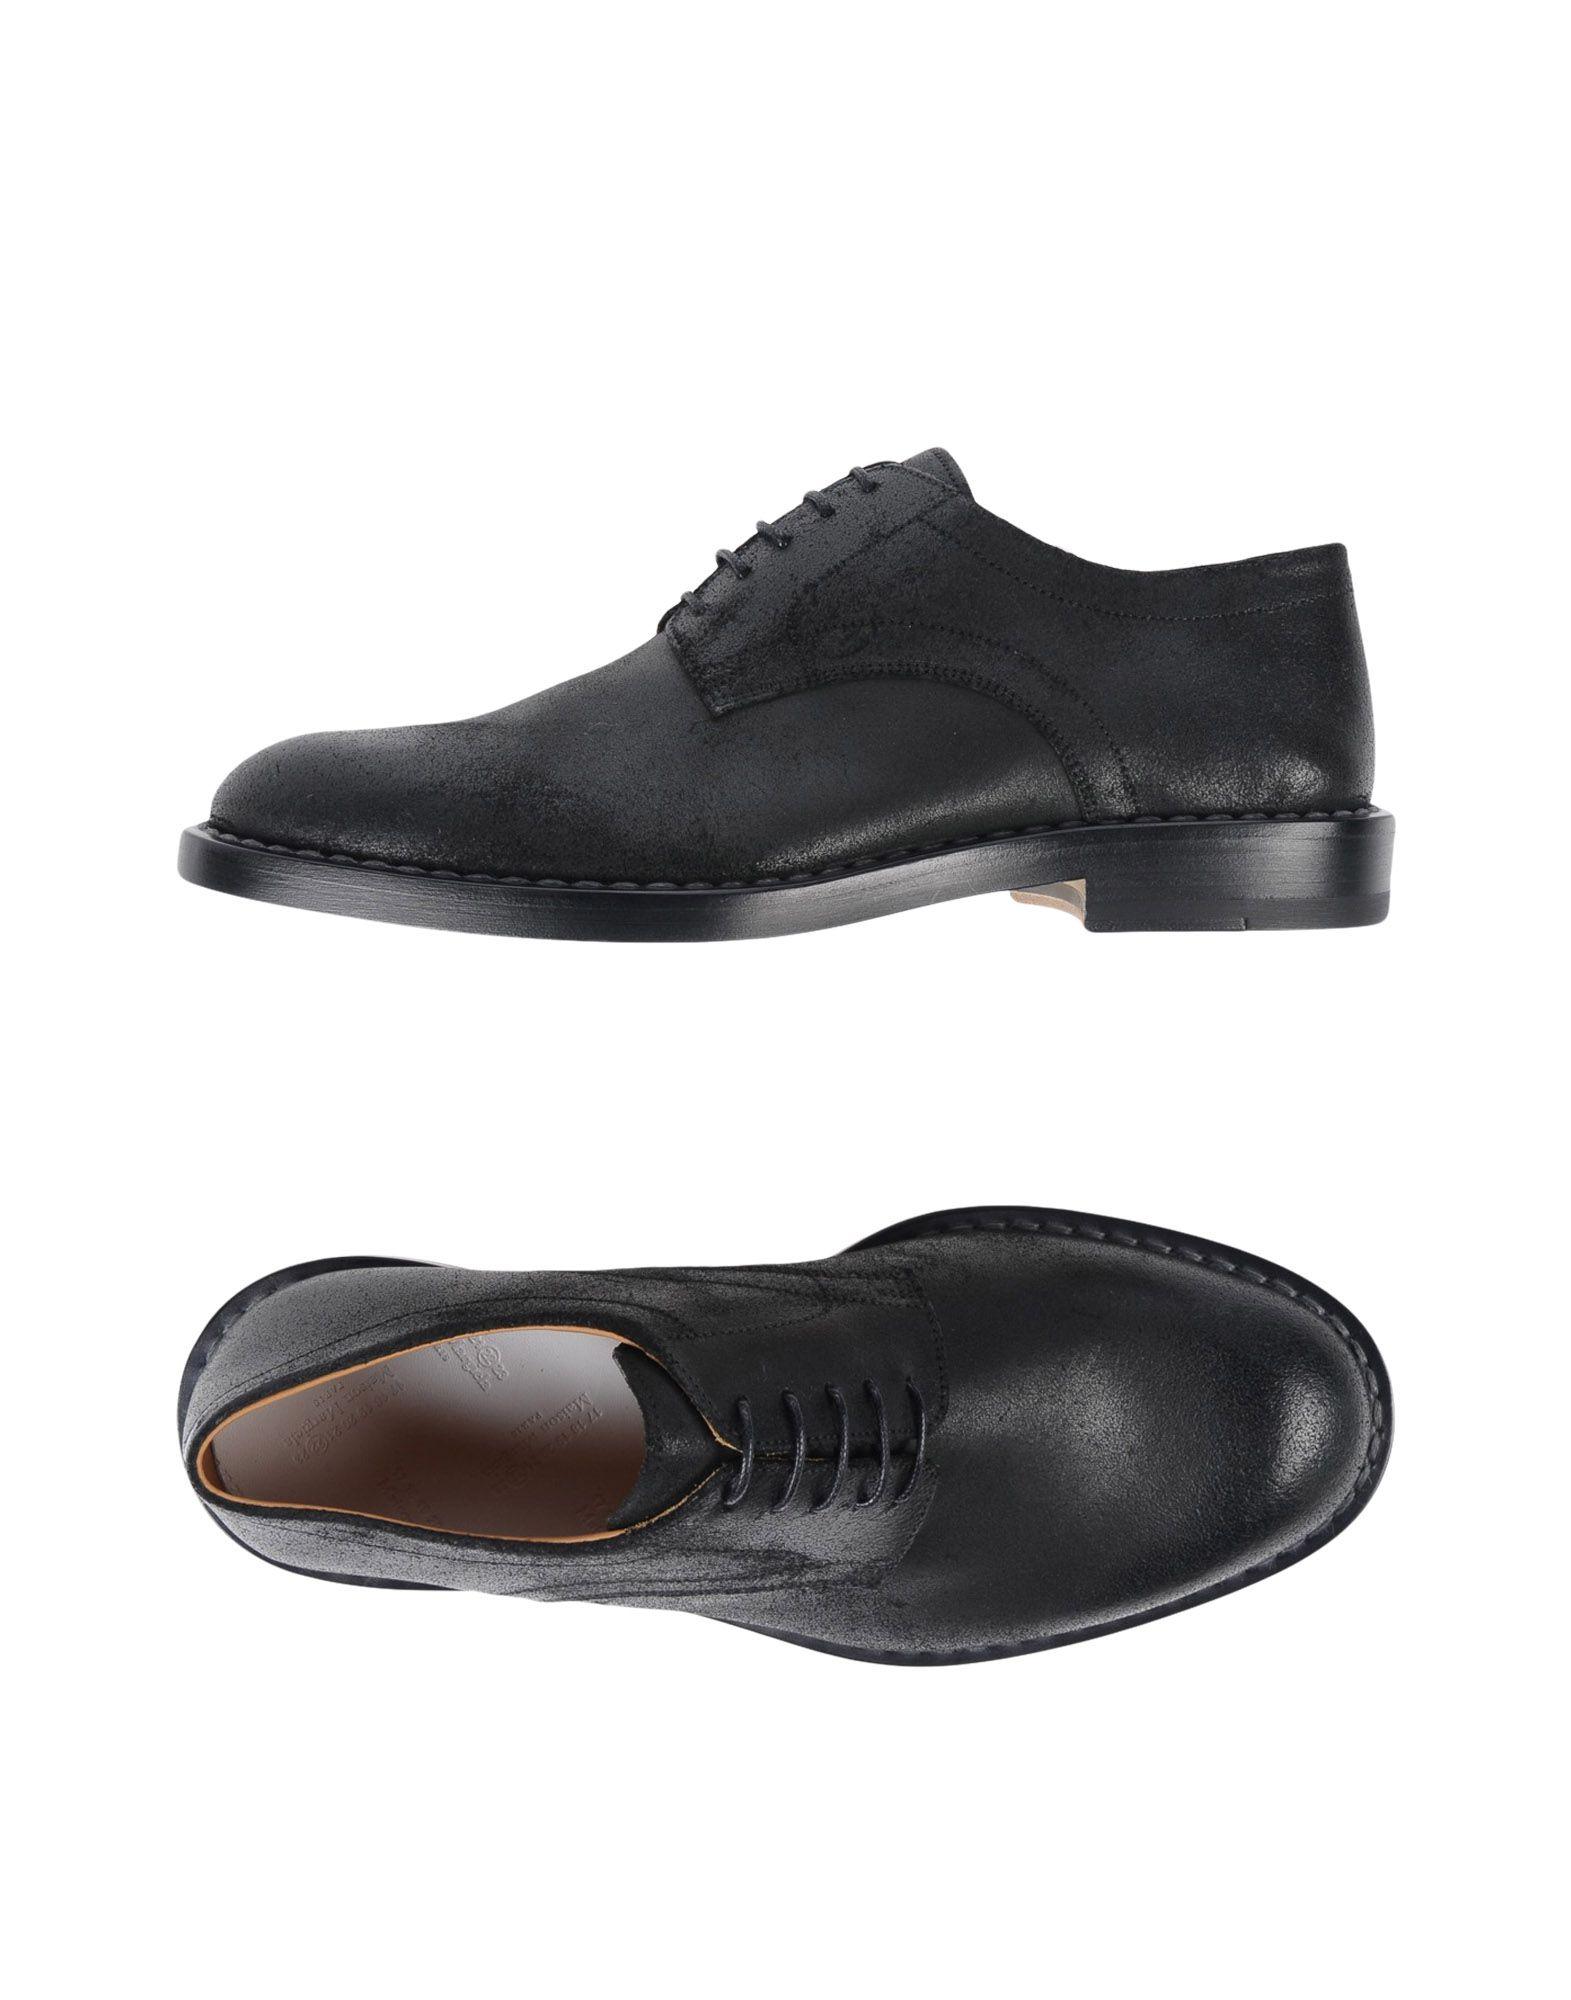 Maison Margiela Schnürschuhe 11439767VH Herren  11439767VH Schnürschuhe Neue Schuhe d01681